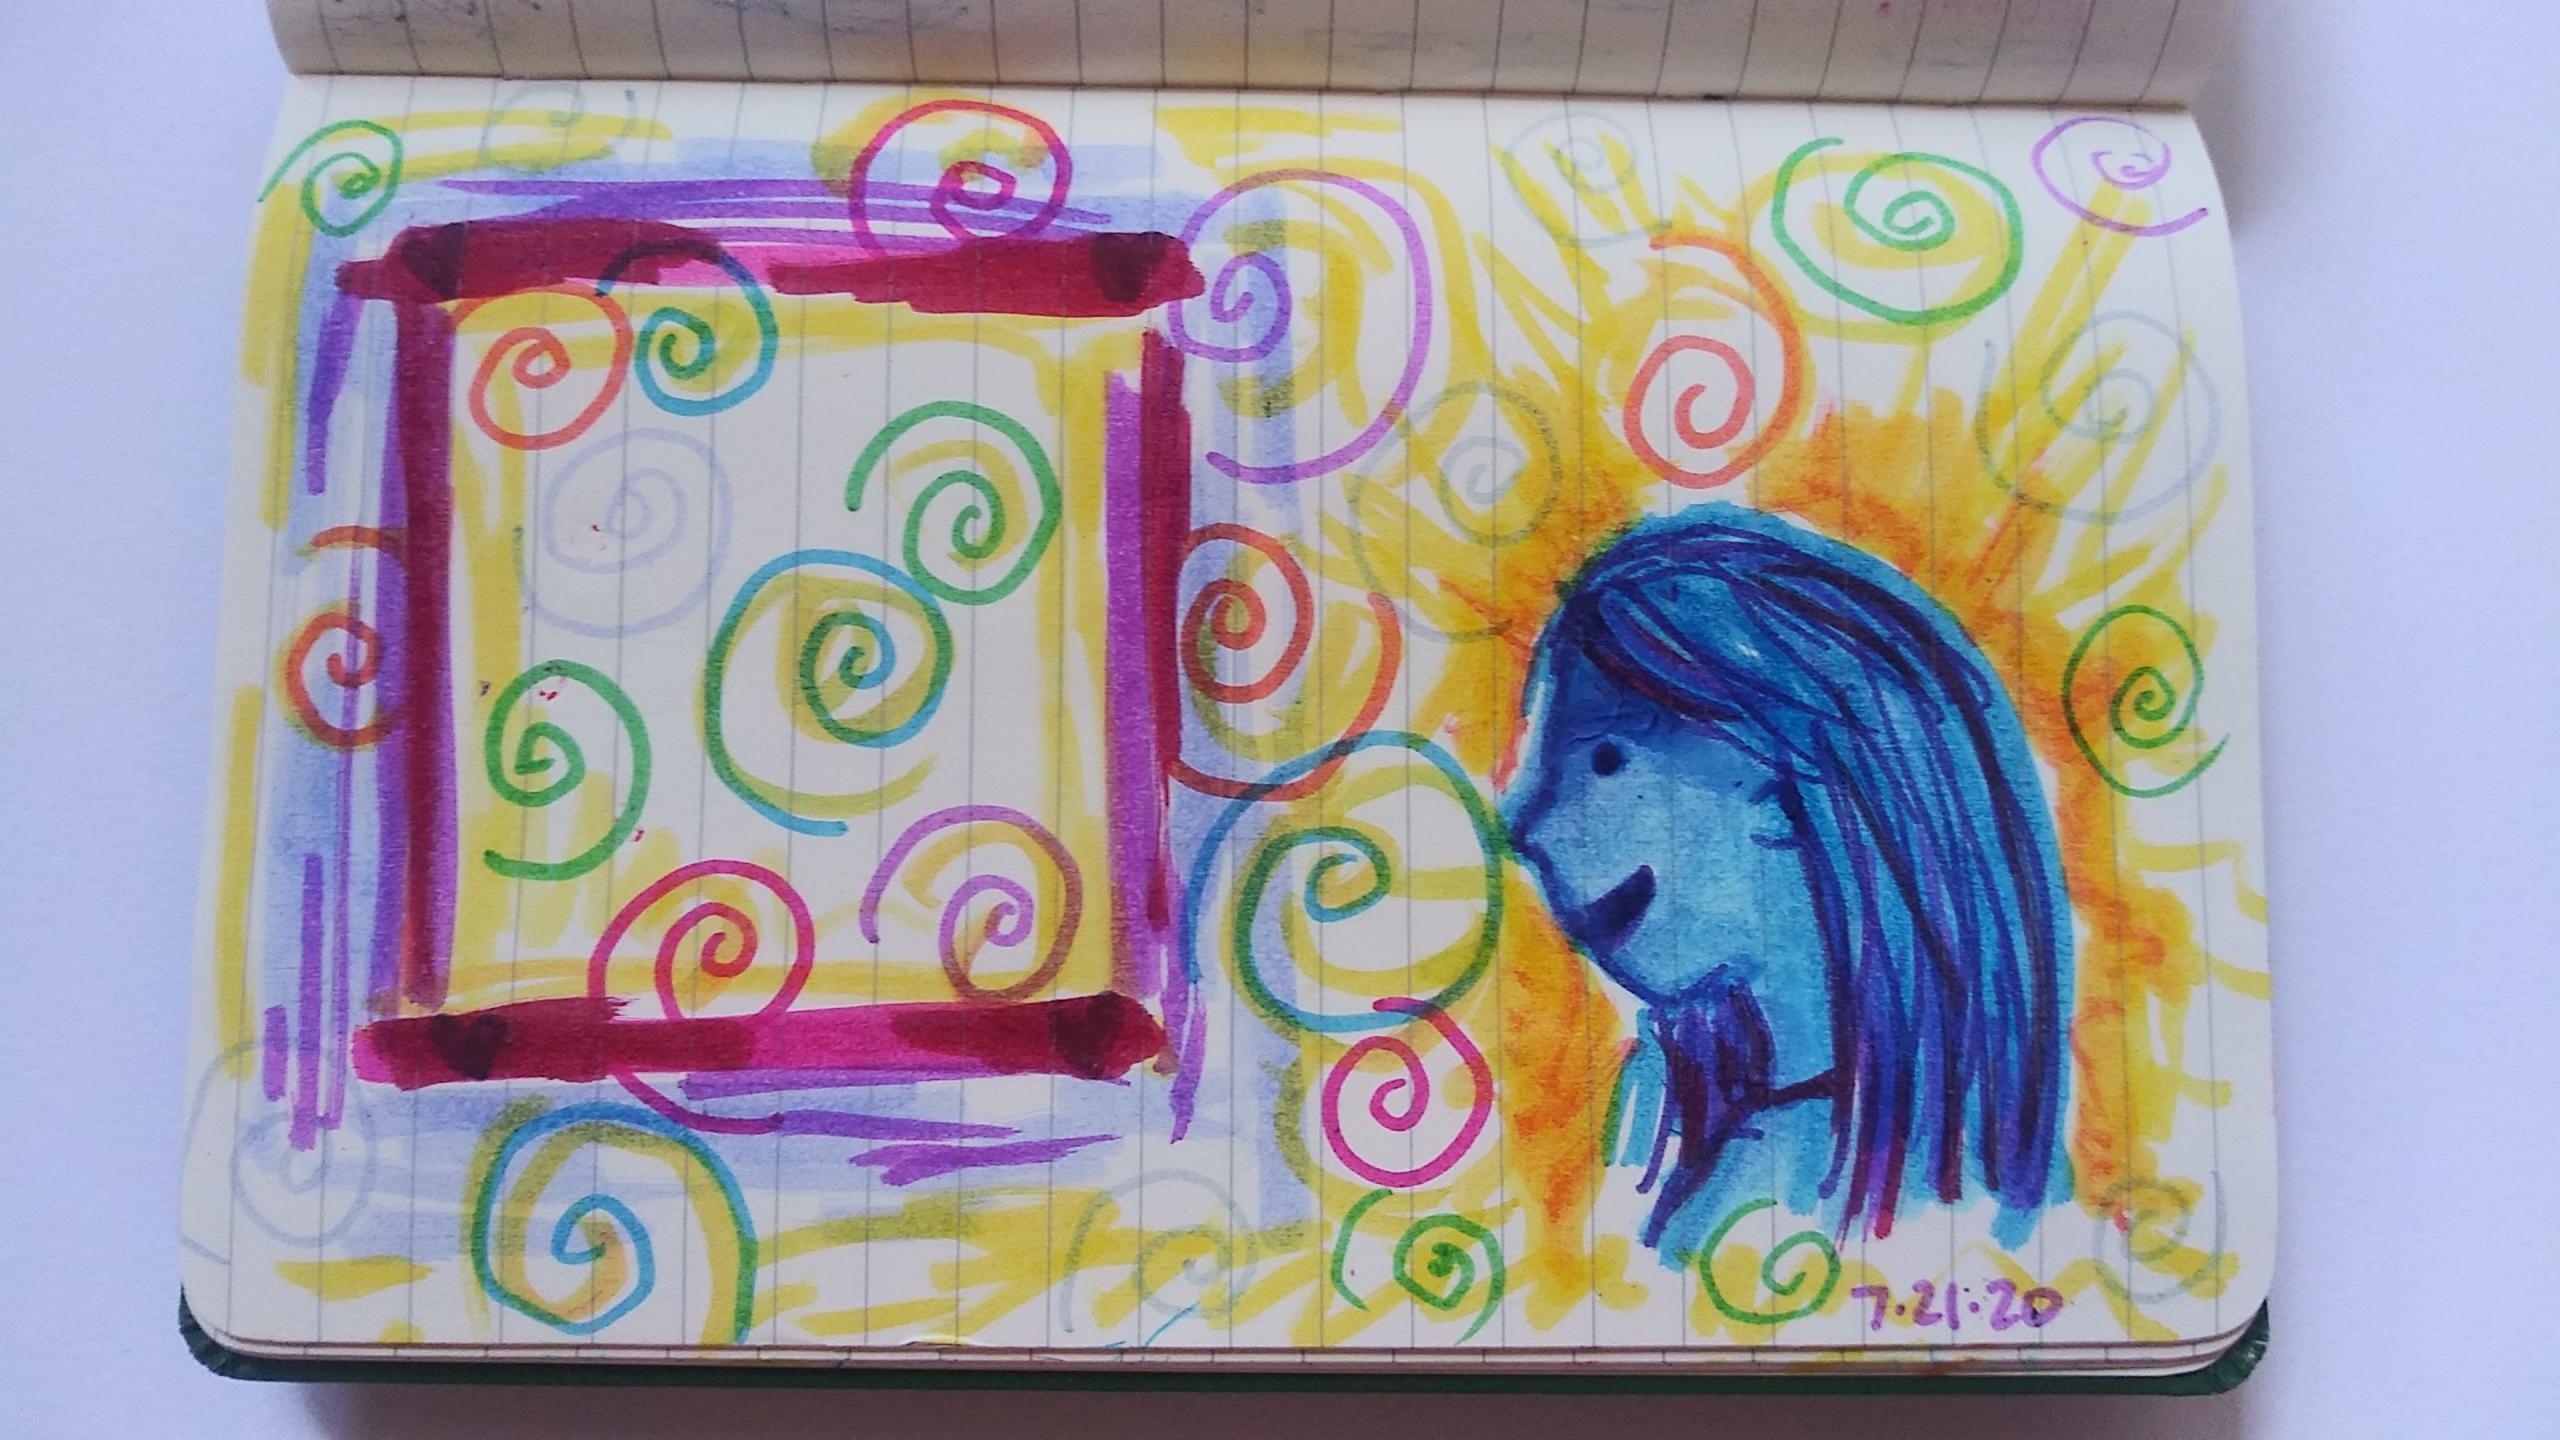 Doodle Reflection: Thinking Inside the Box